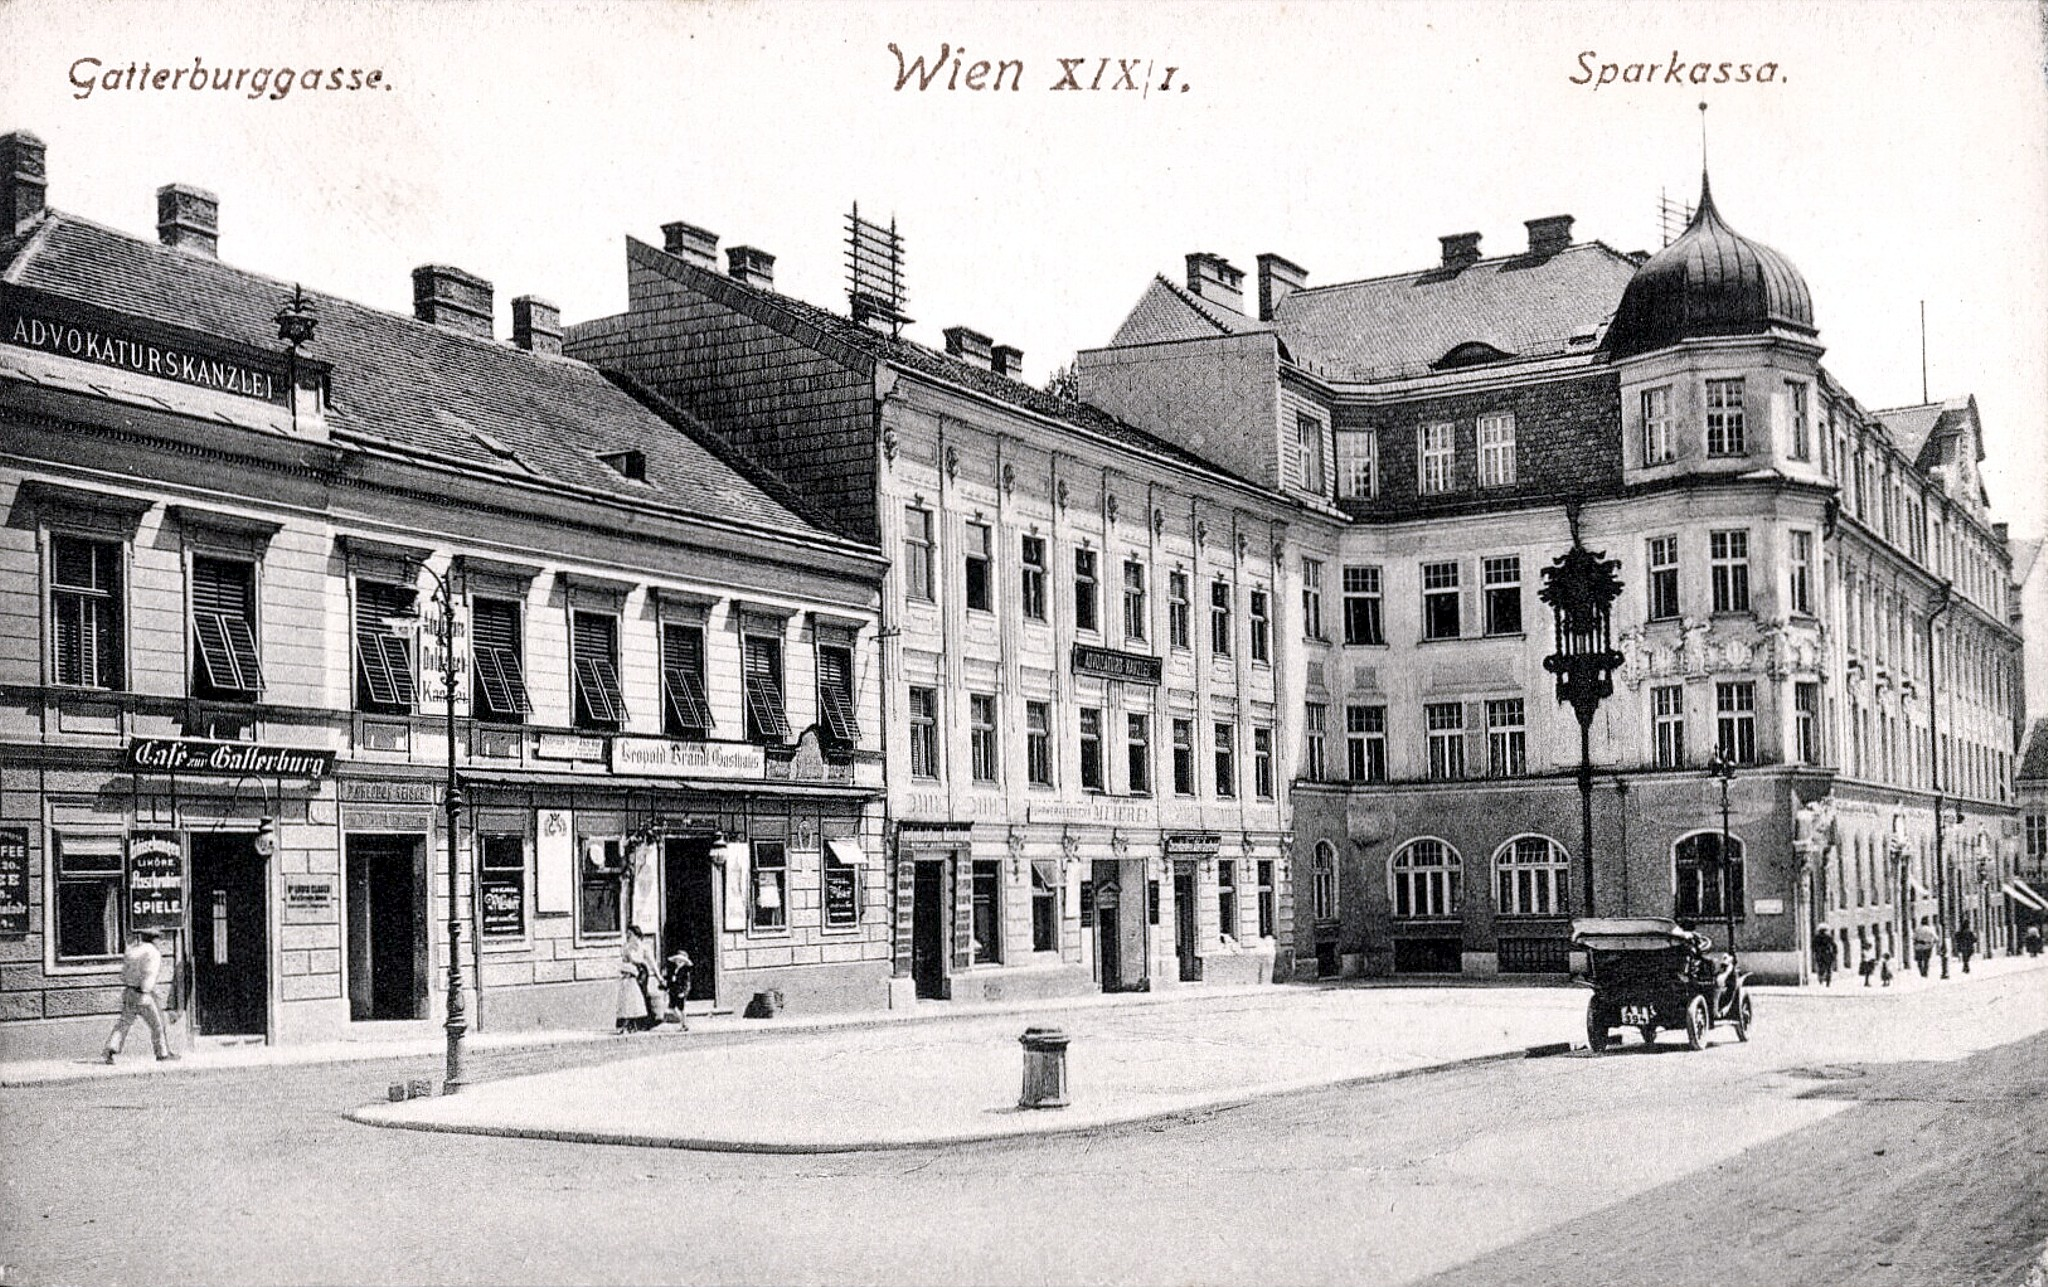 Wien 1910, Gatterburggasse